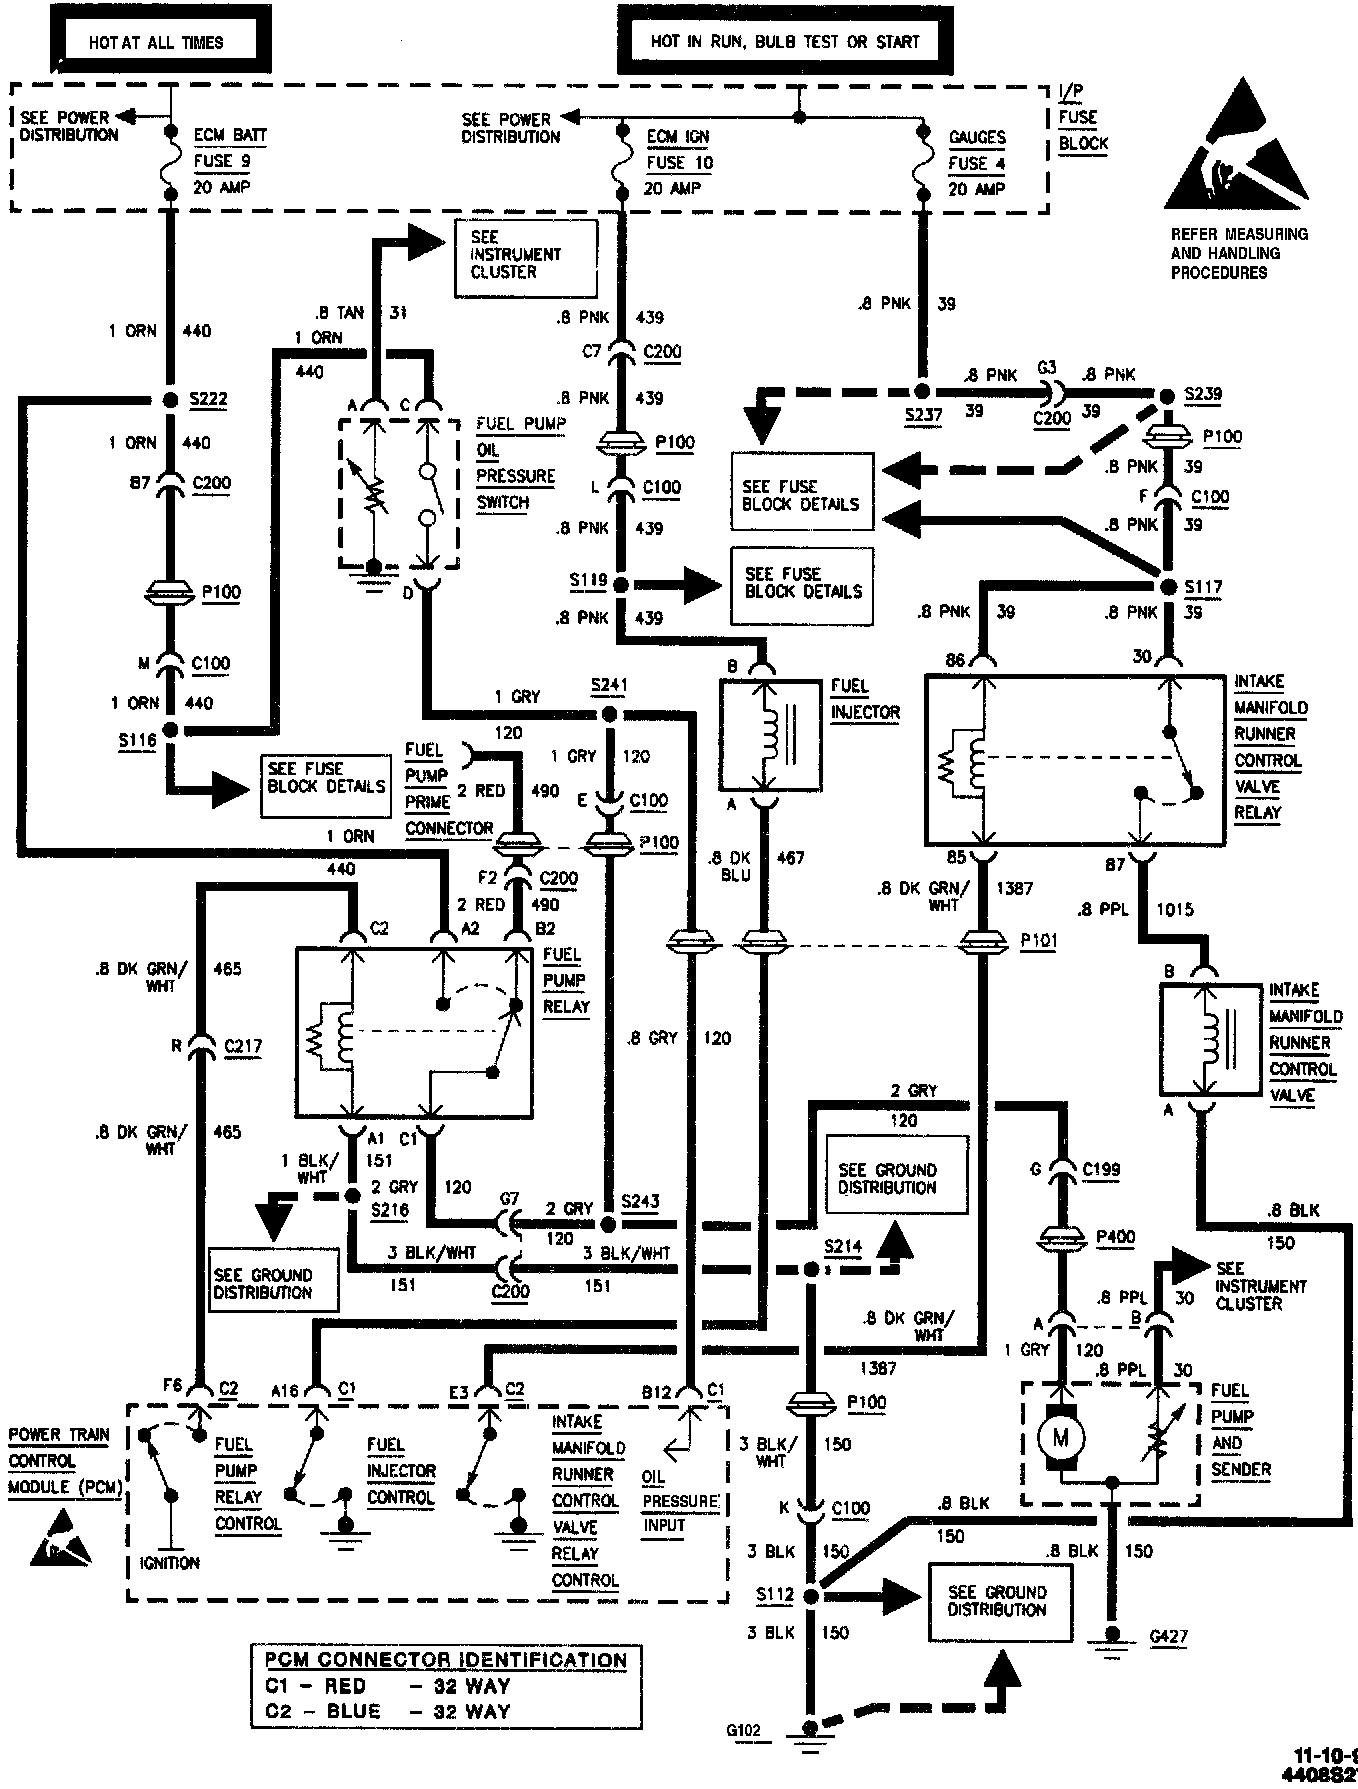 [DIAGRAM_0HG]  2001 Chevy Blazer Wiring Diagram - Vw Bug Wiring Harness Kit -  fusebox.los-dodol.jeanjaures37.fr | 1986 Chevy Blazer Wiring Diagram |  | Wiring Diagram